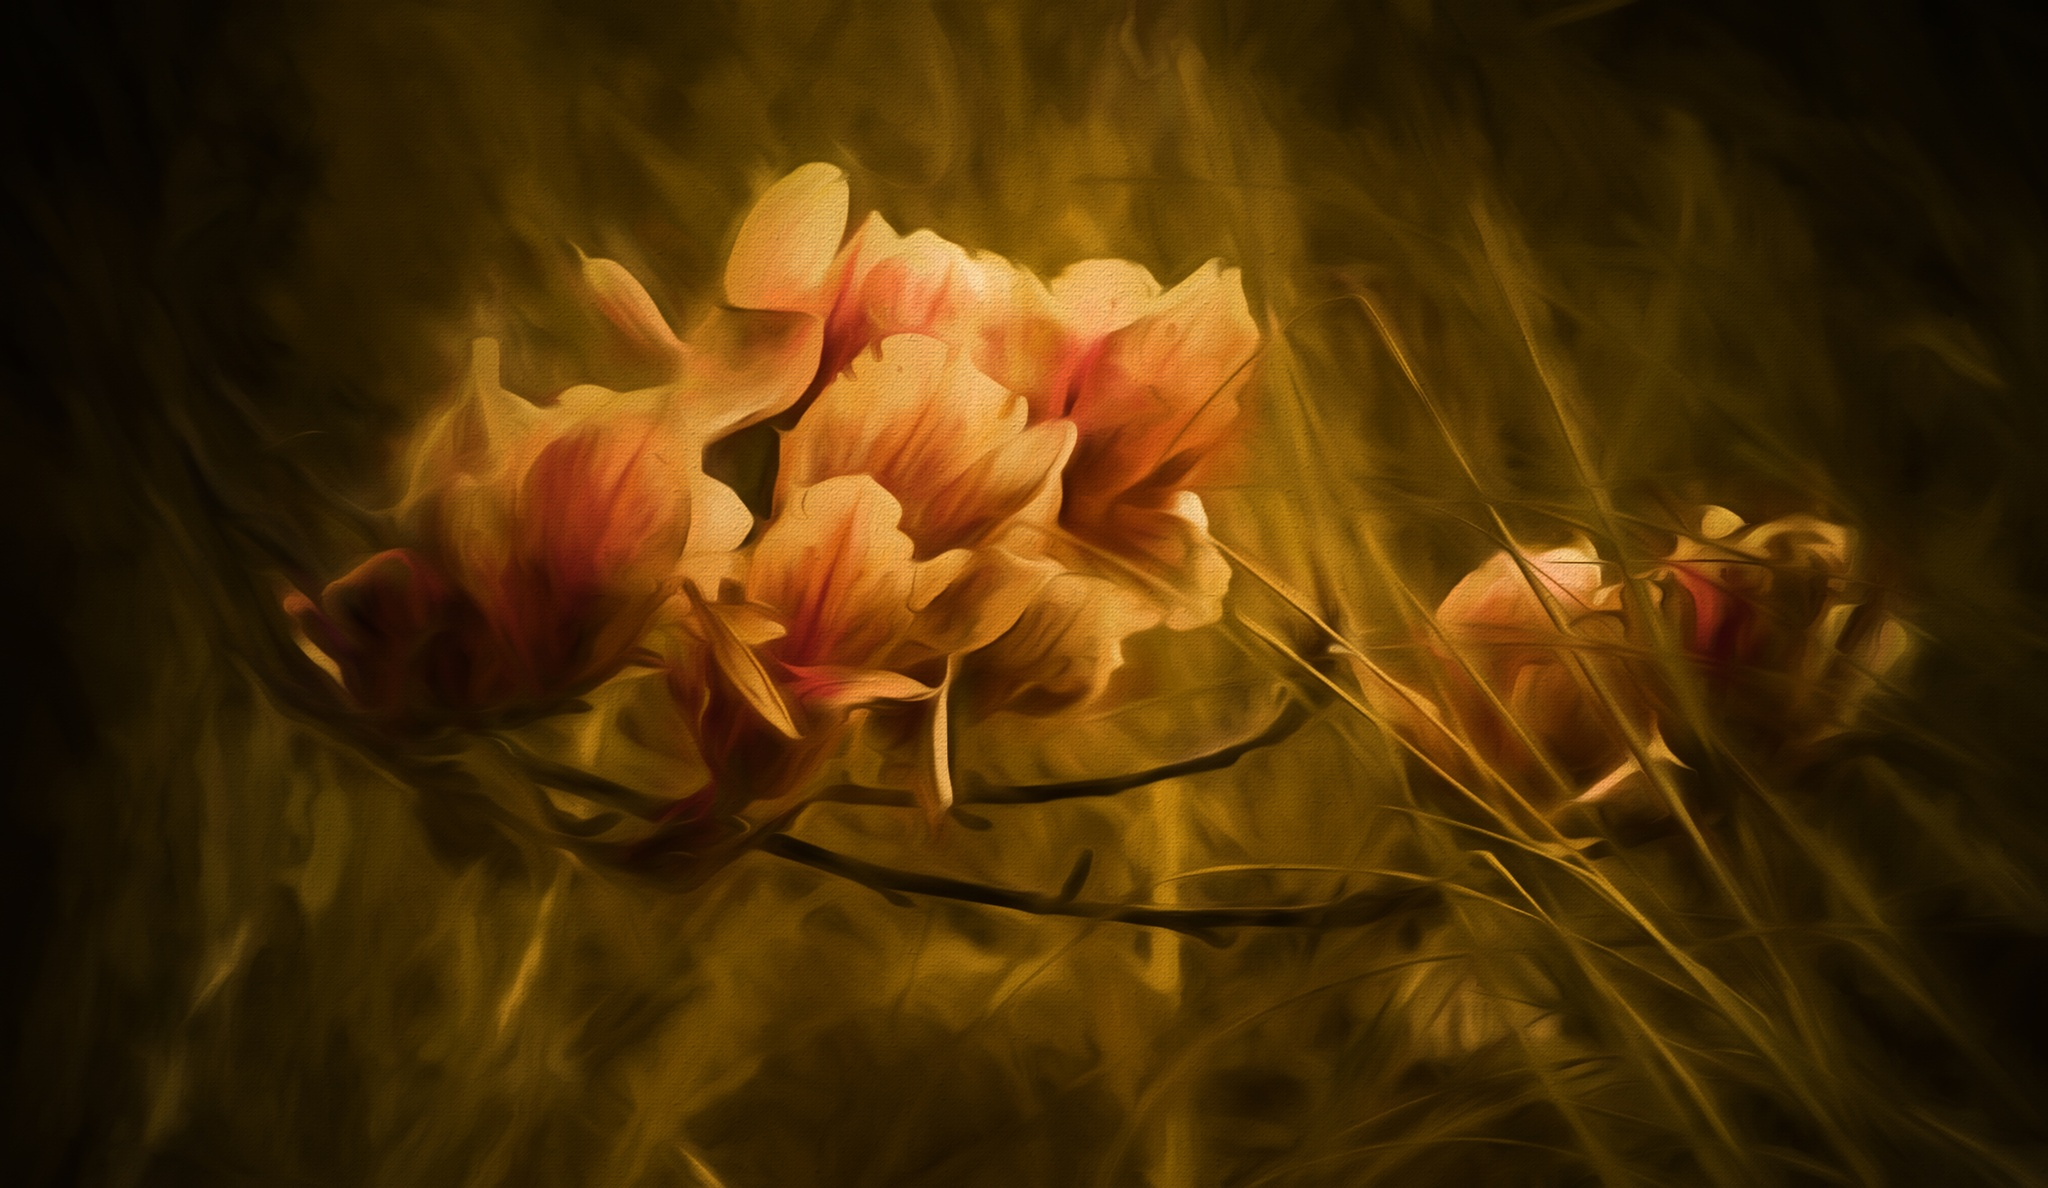 Magnolia Dreams 433 by JohnEllingson